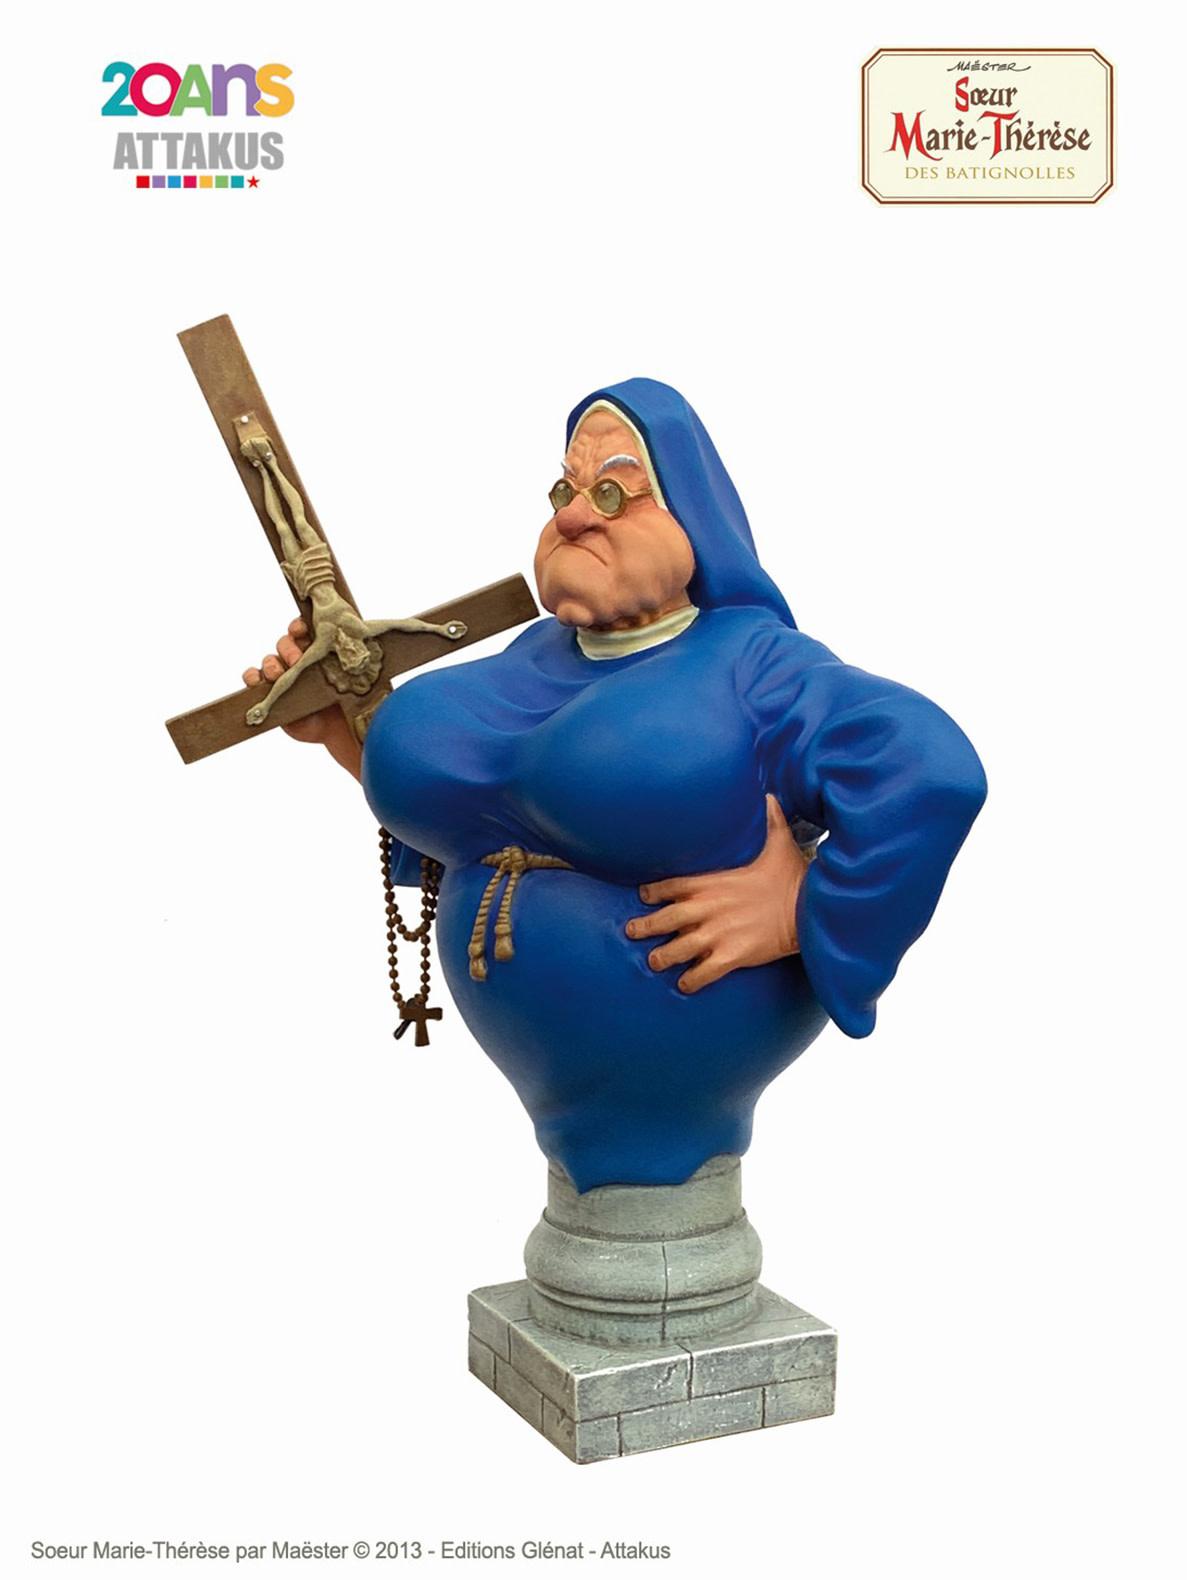 Attakus Sister Marie-Therese des Batignolles Statue